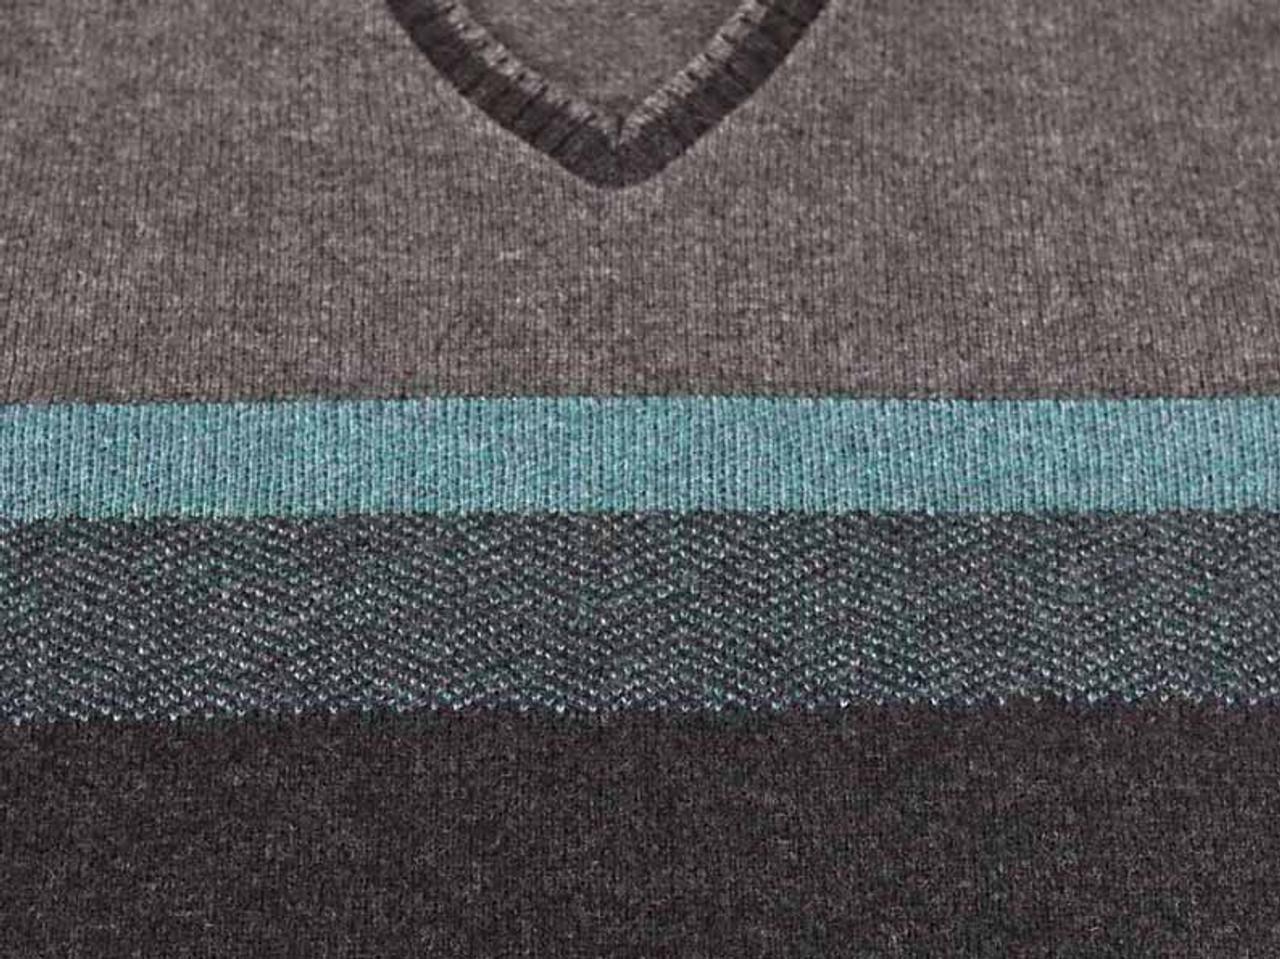 Swatch - Charcoal / Lagoon / Grey